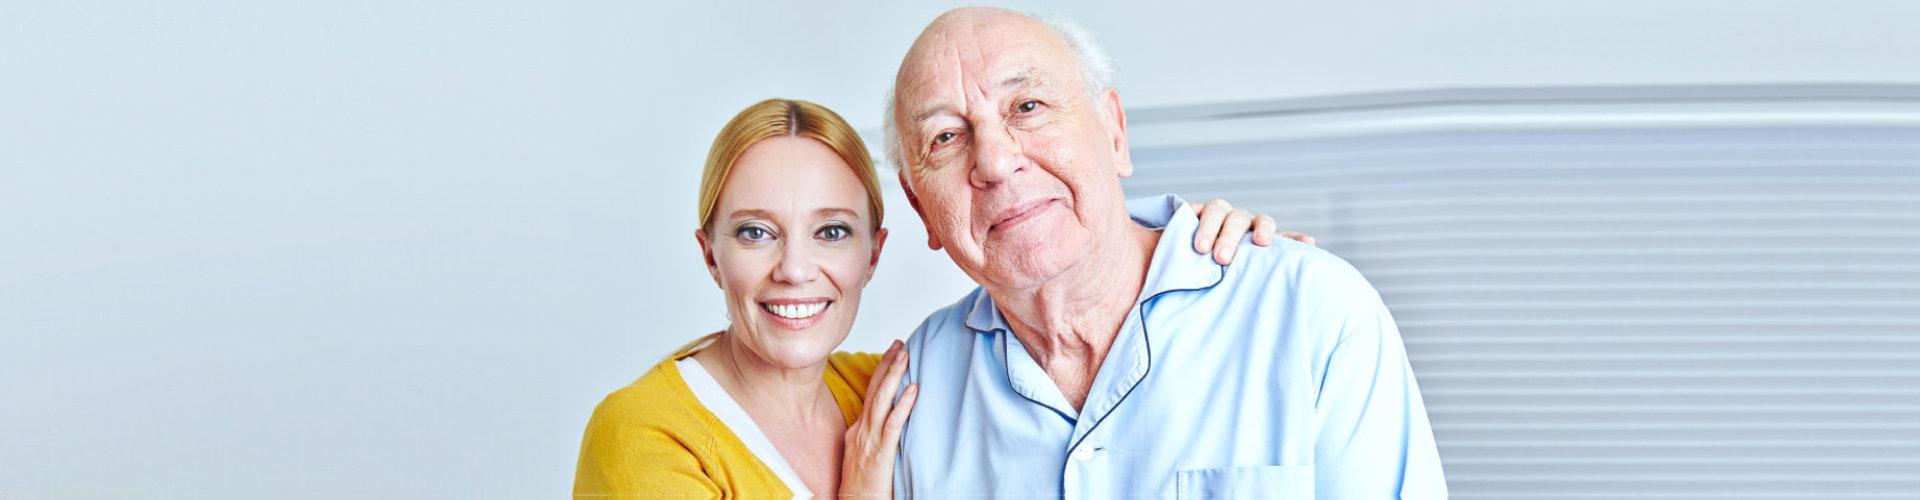 senior man with caregiver smiling